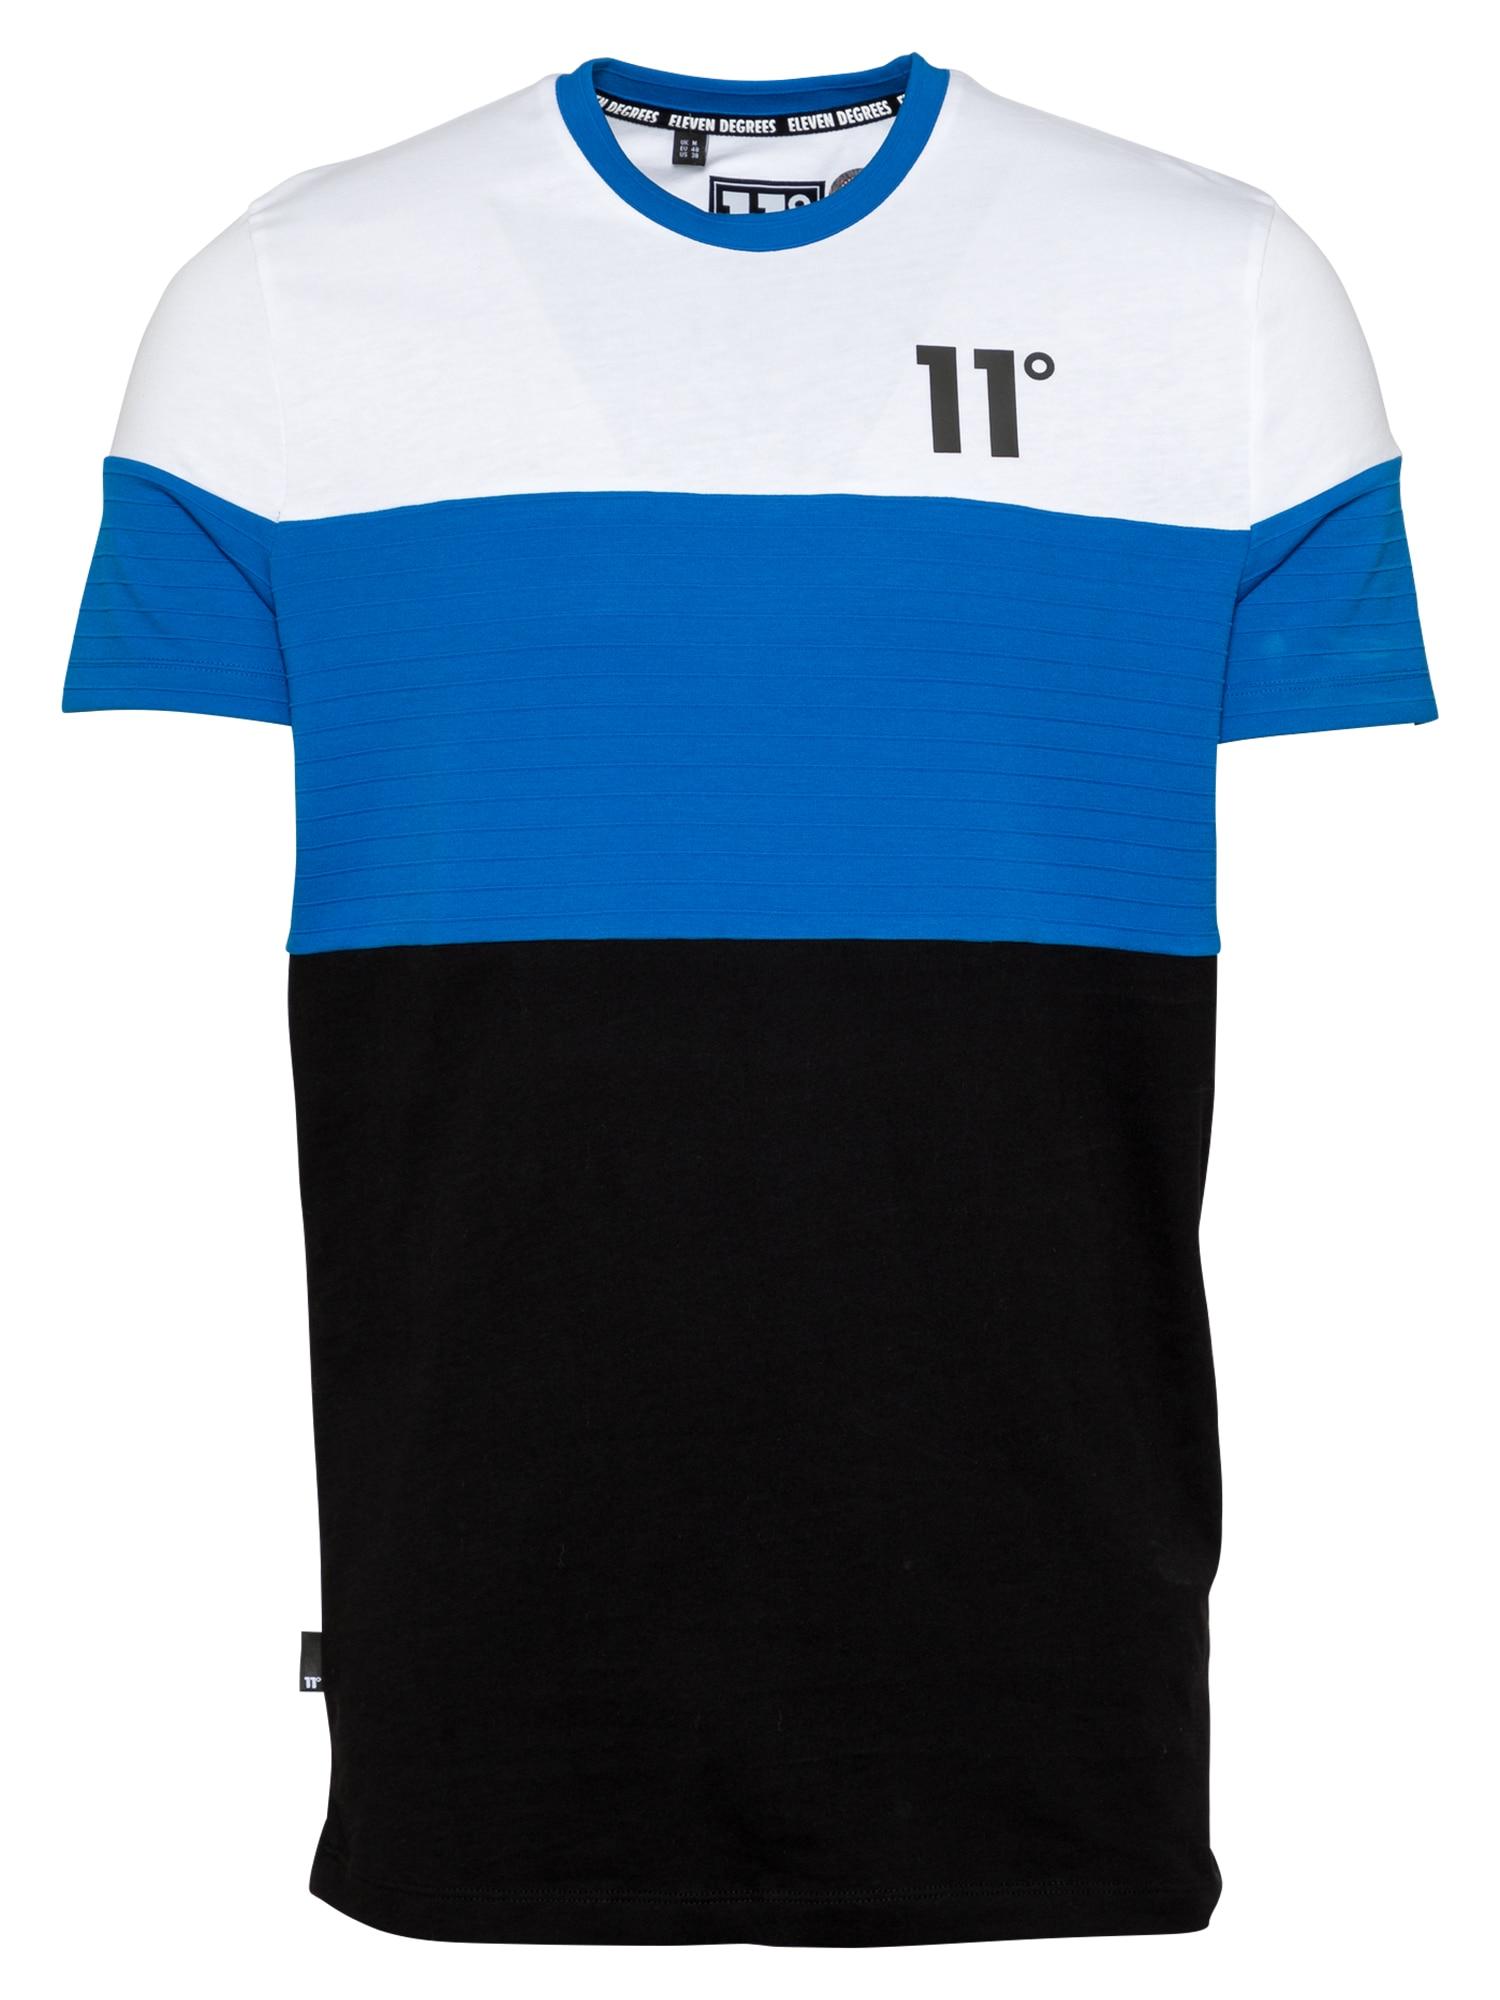 "11 Degrees Marškinėliai balta / juoda / sodri mėlyna (""karališka"")"